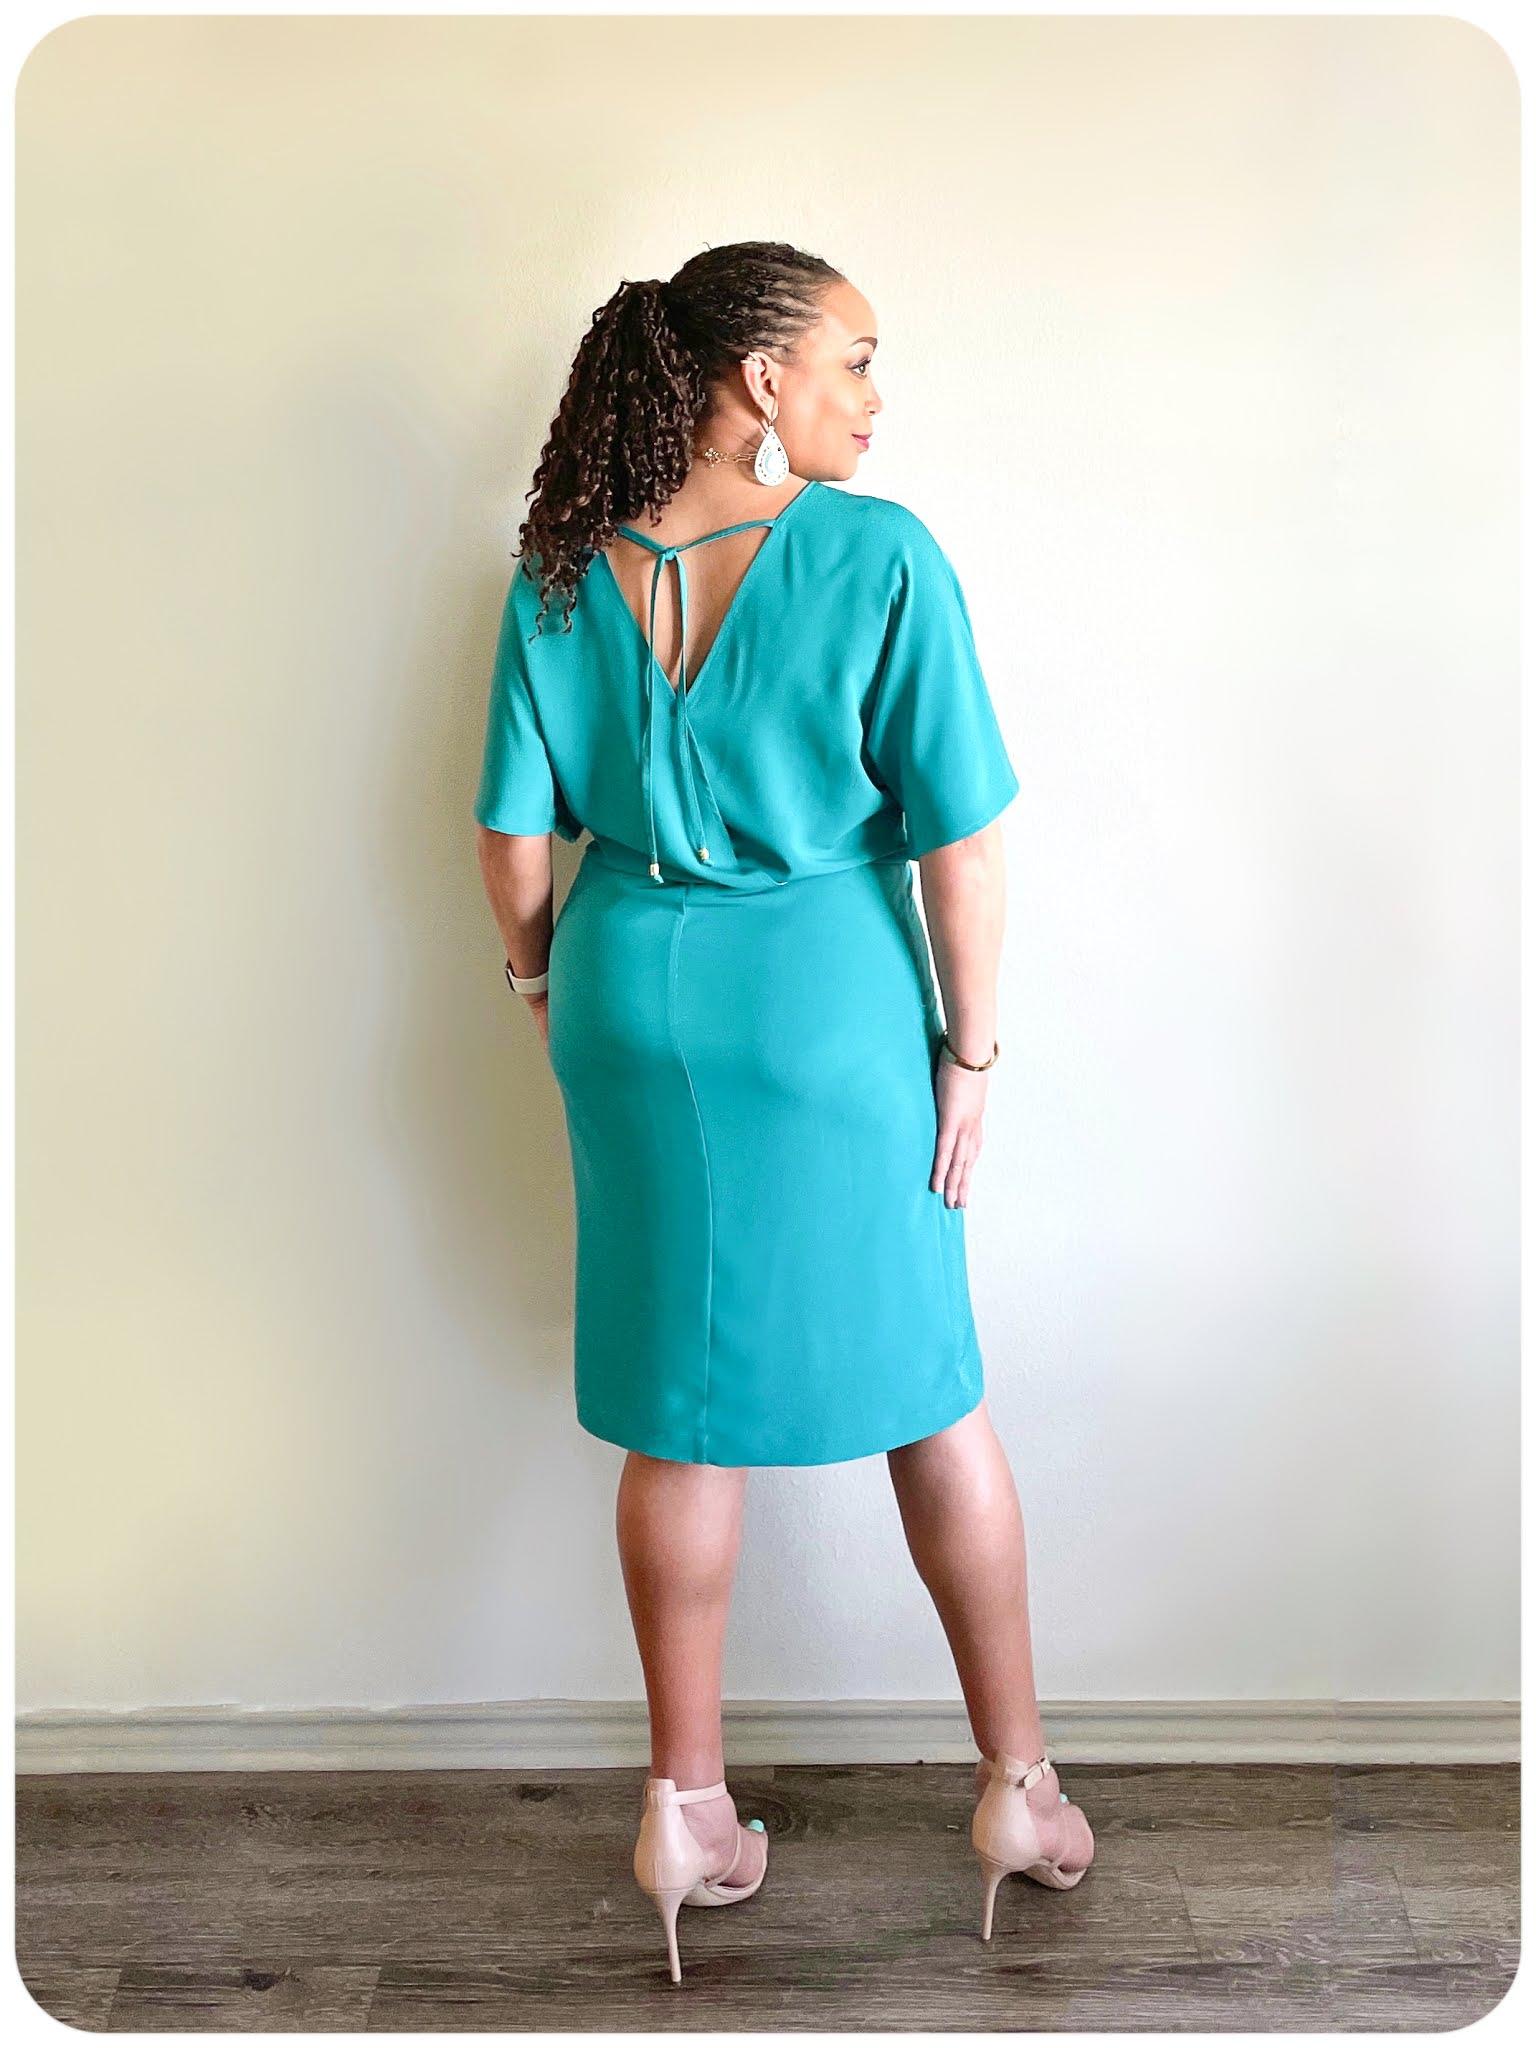 Simplicity 9010 - Erica Bunker DIY Style!